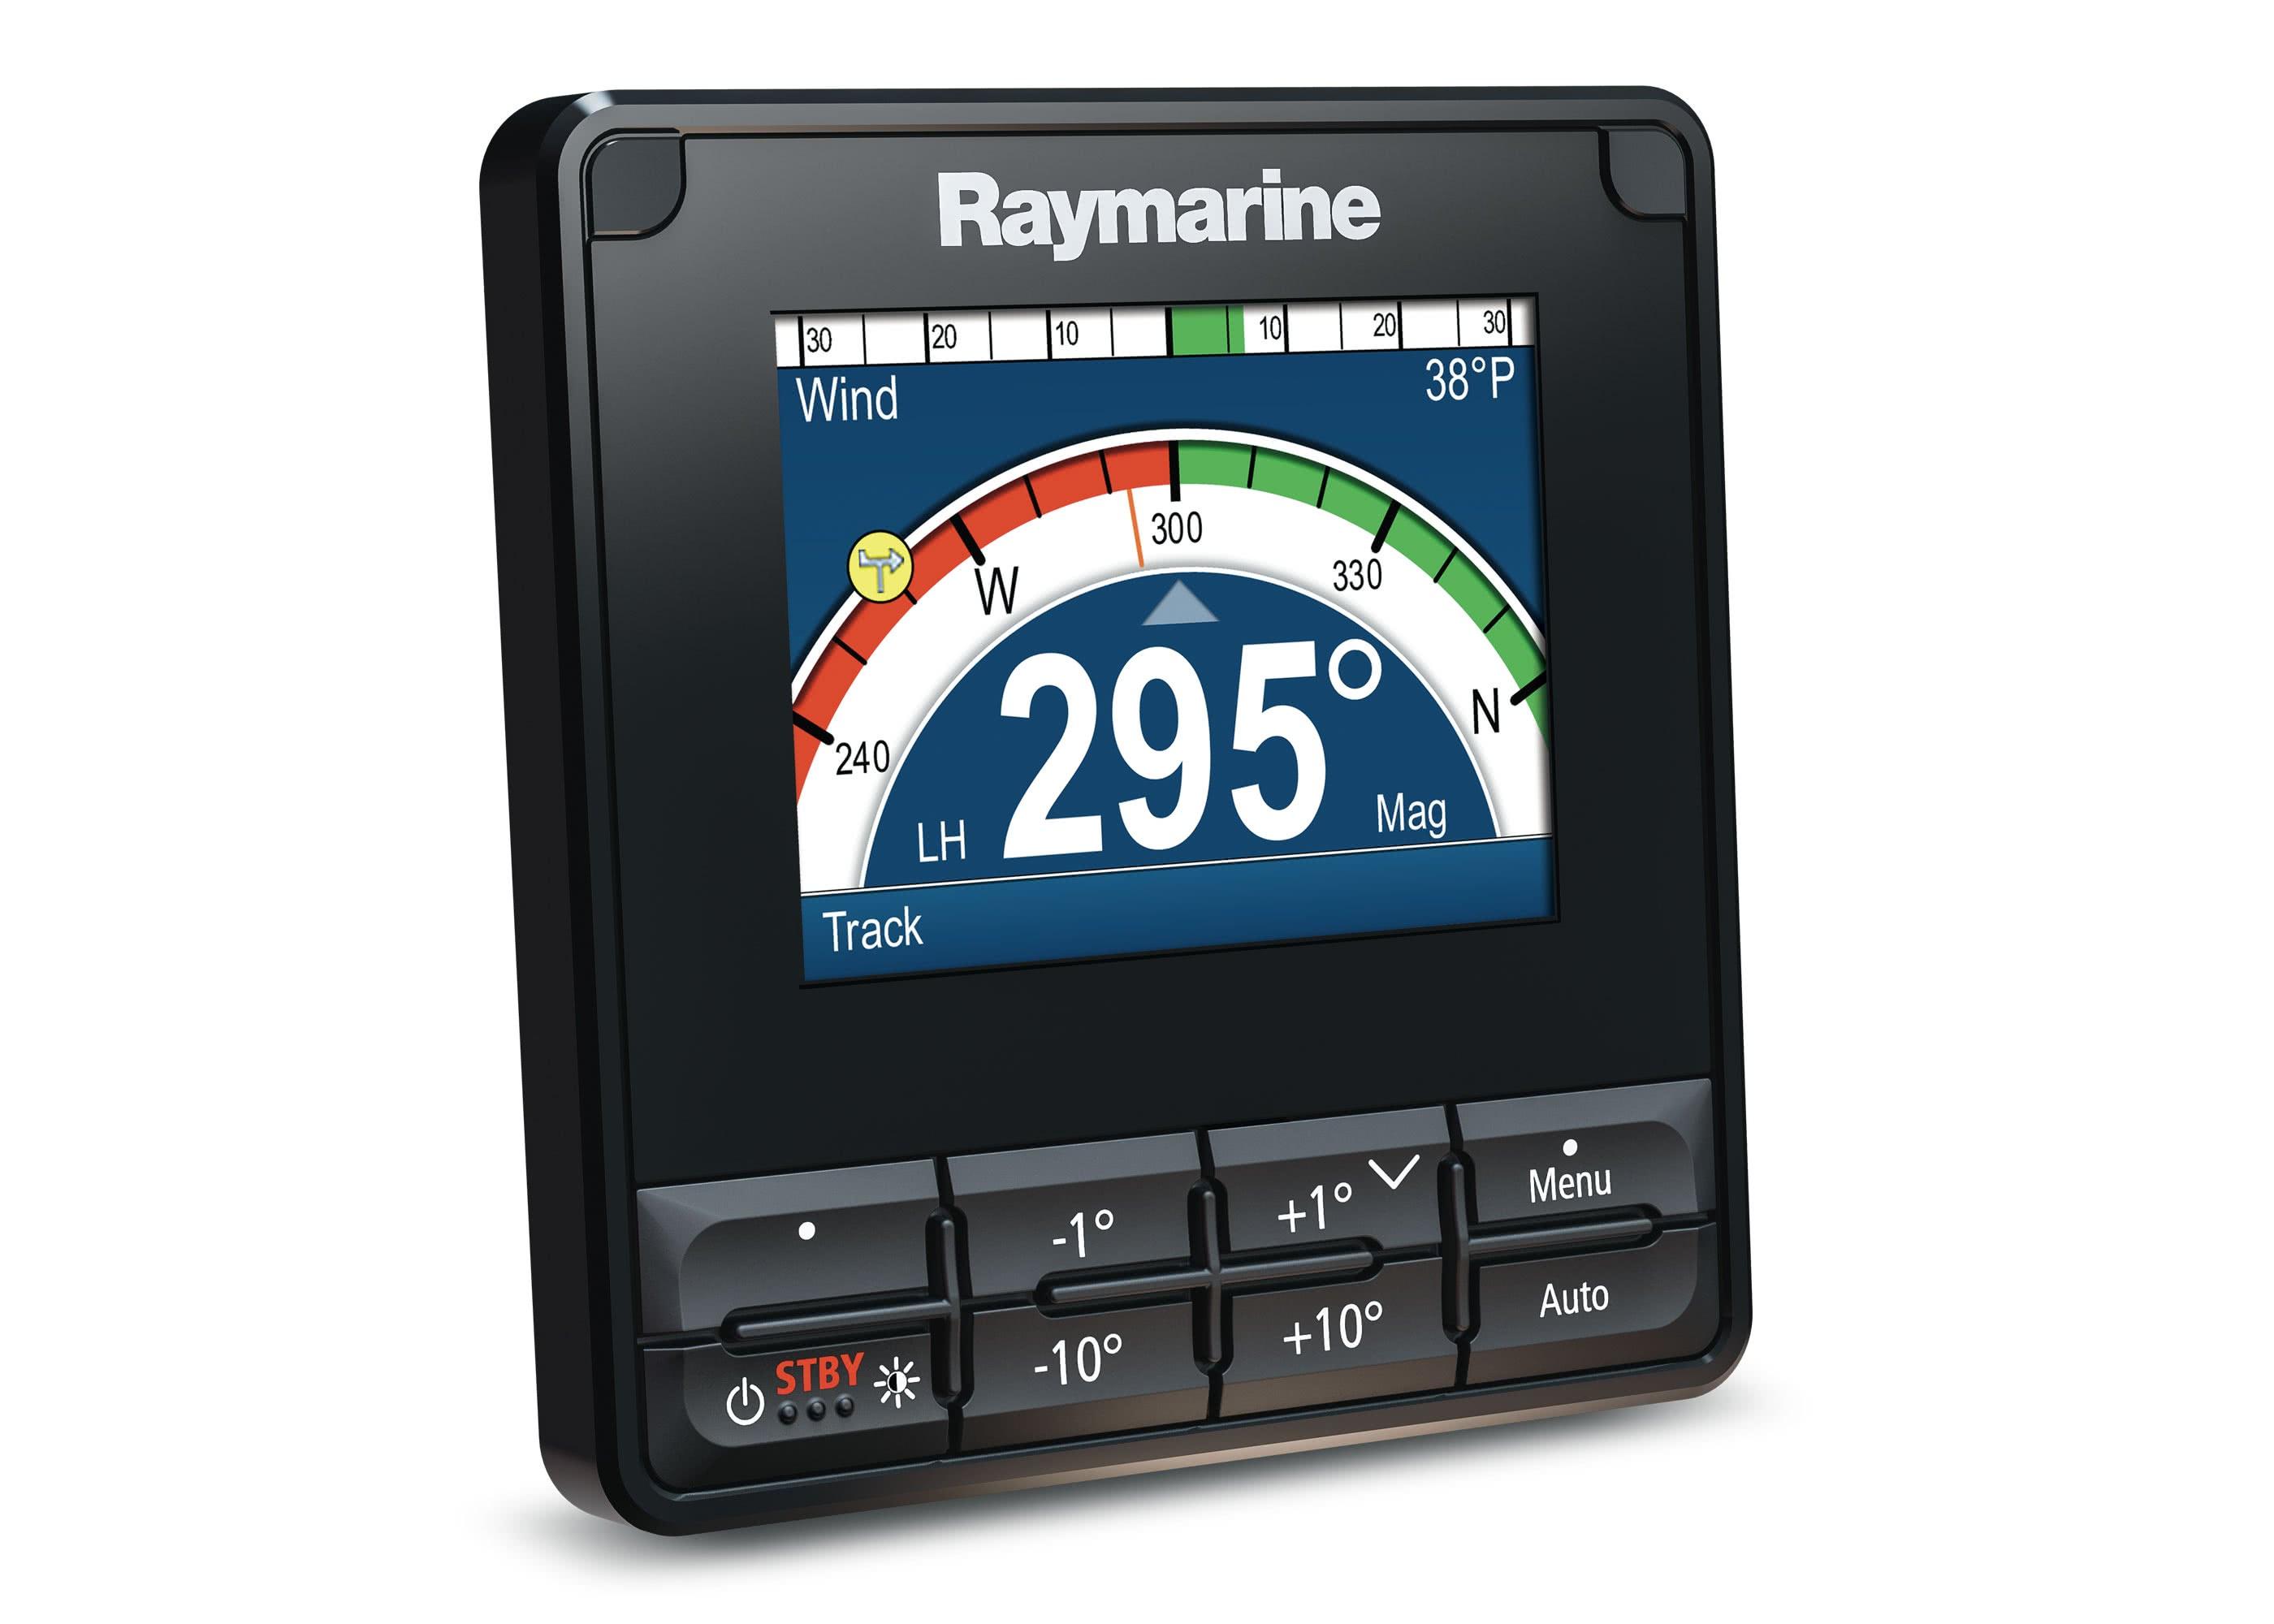 21494_Raymarine_Autopilot_Bediengeraet_p70s.jpg